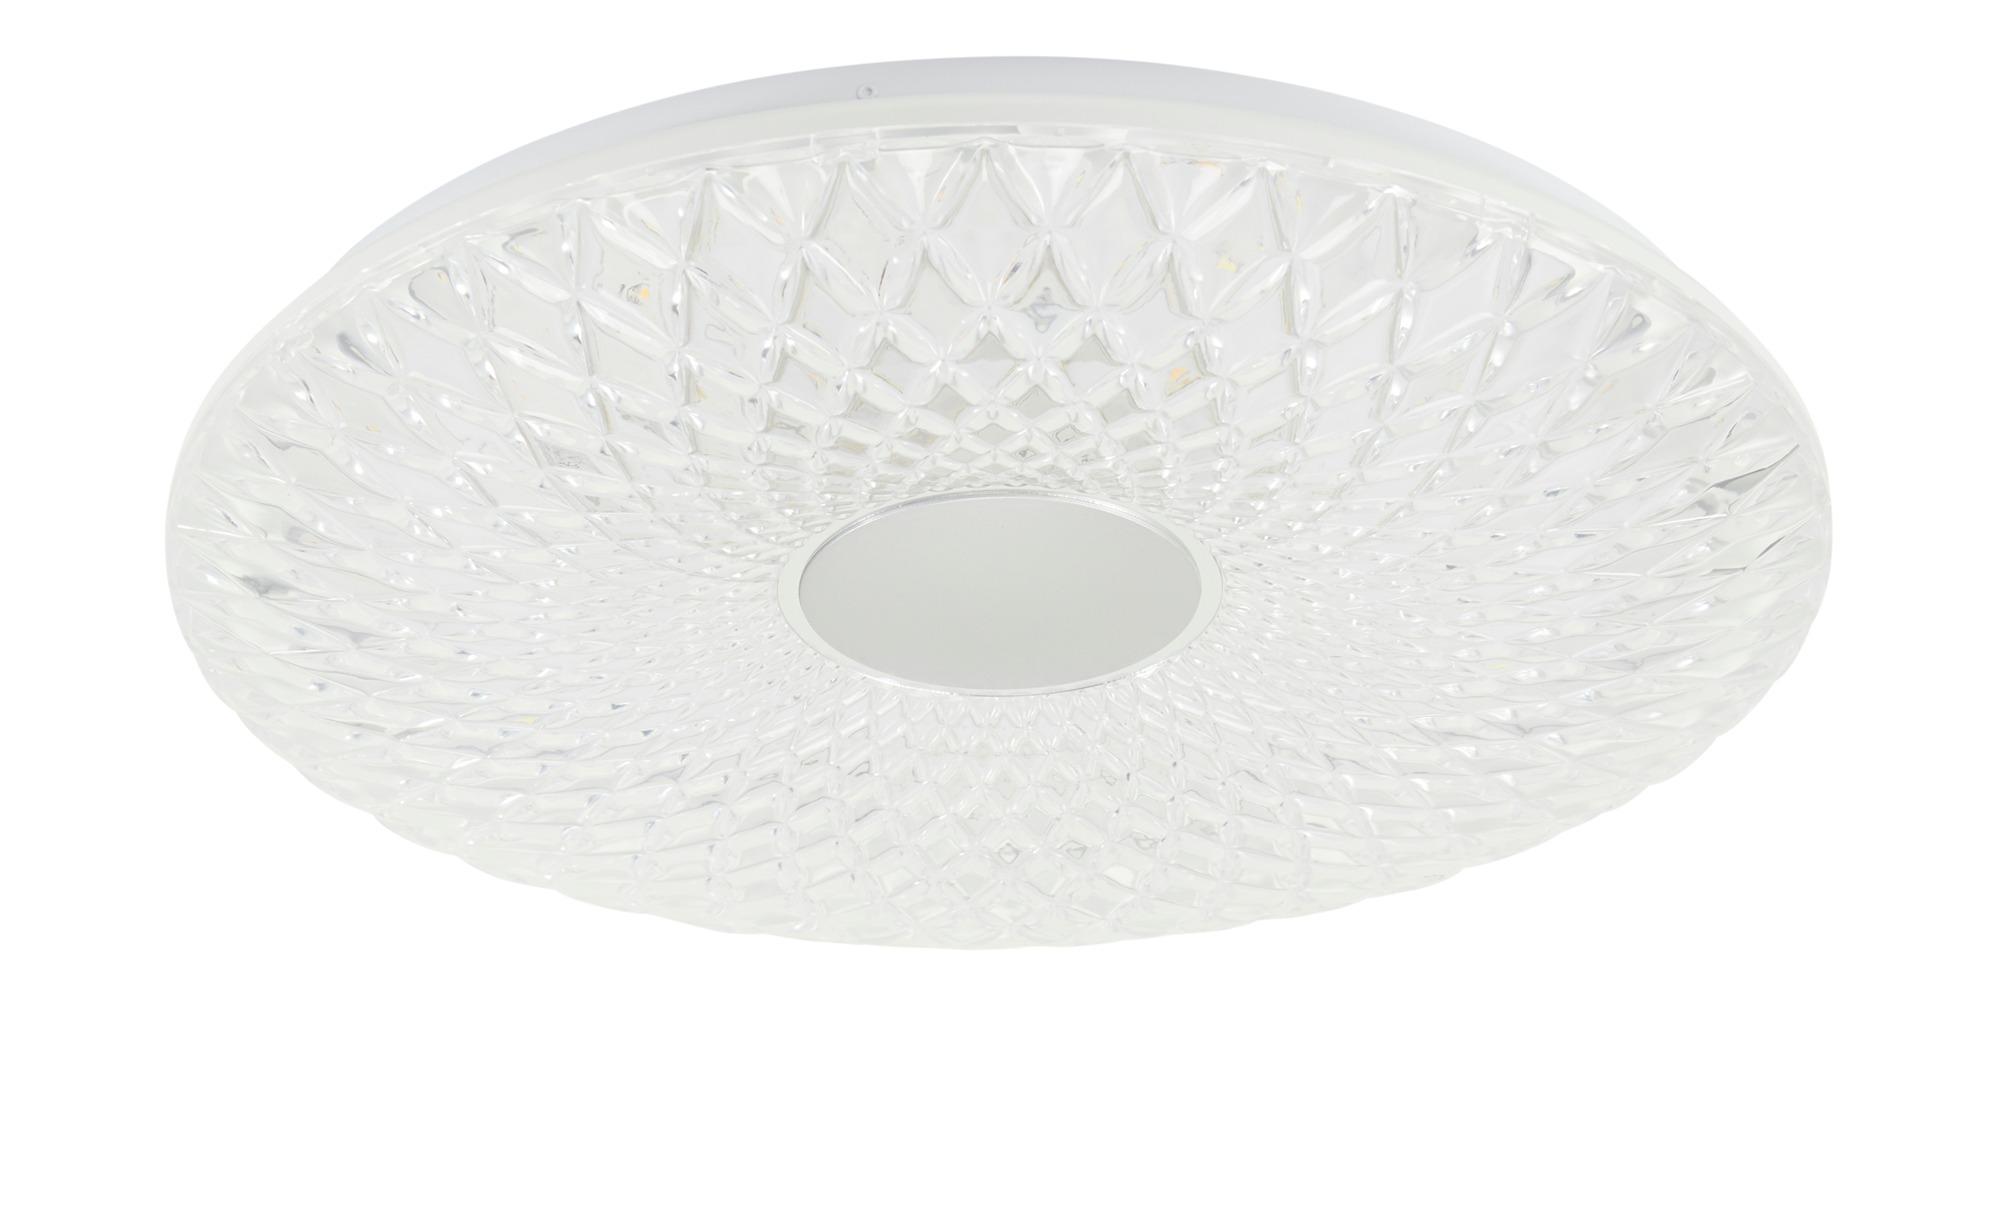 KHG LED-Deckenleuchte, 1-flammig, Kristalloptik ¦ transparent/klar ¦ Maße (cm): H: 8 Ø: 50 Lampen & Leuchten > Innenleuchten > Deckenleuchten - Höffner